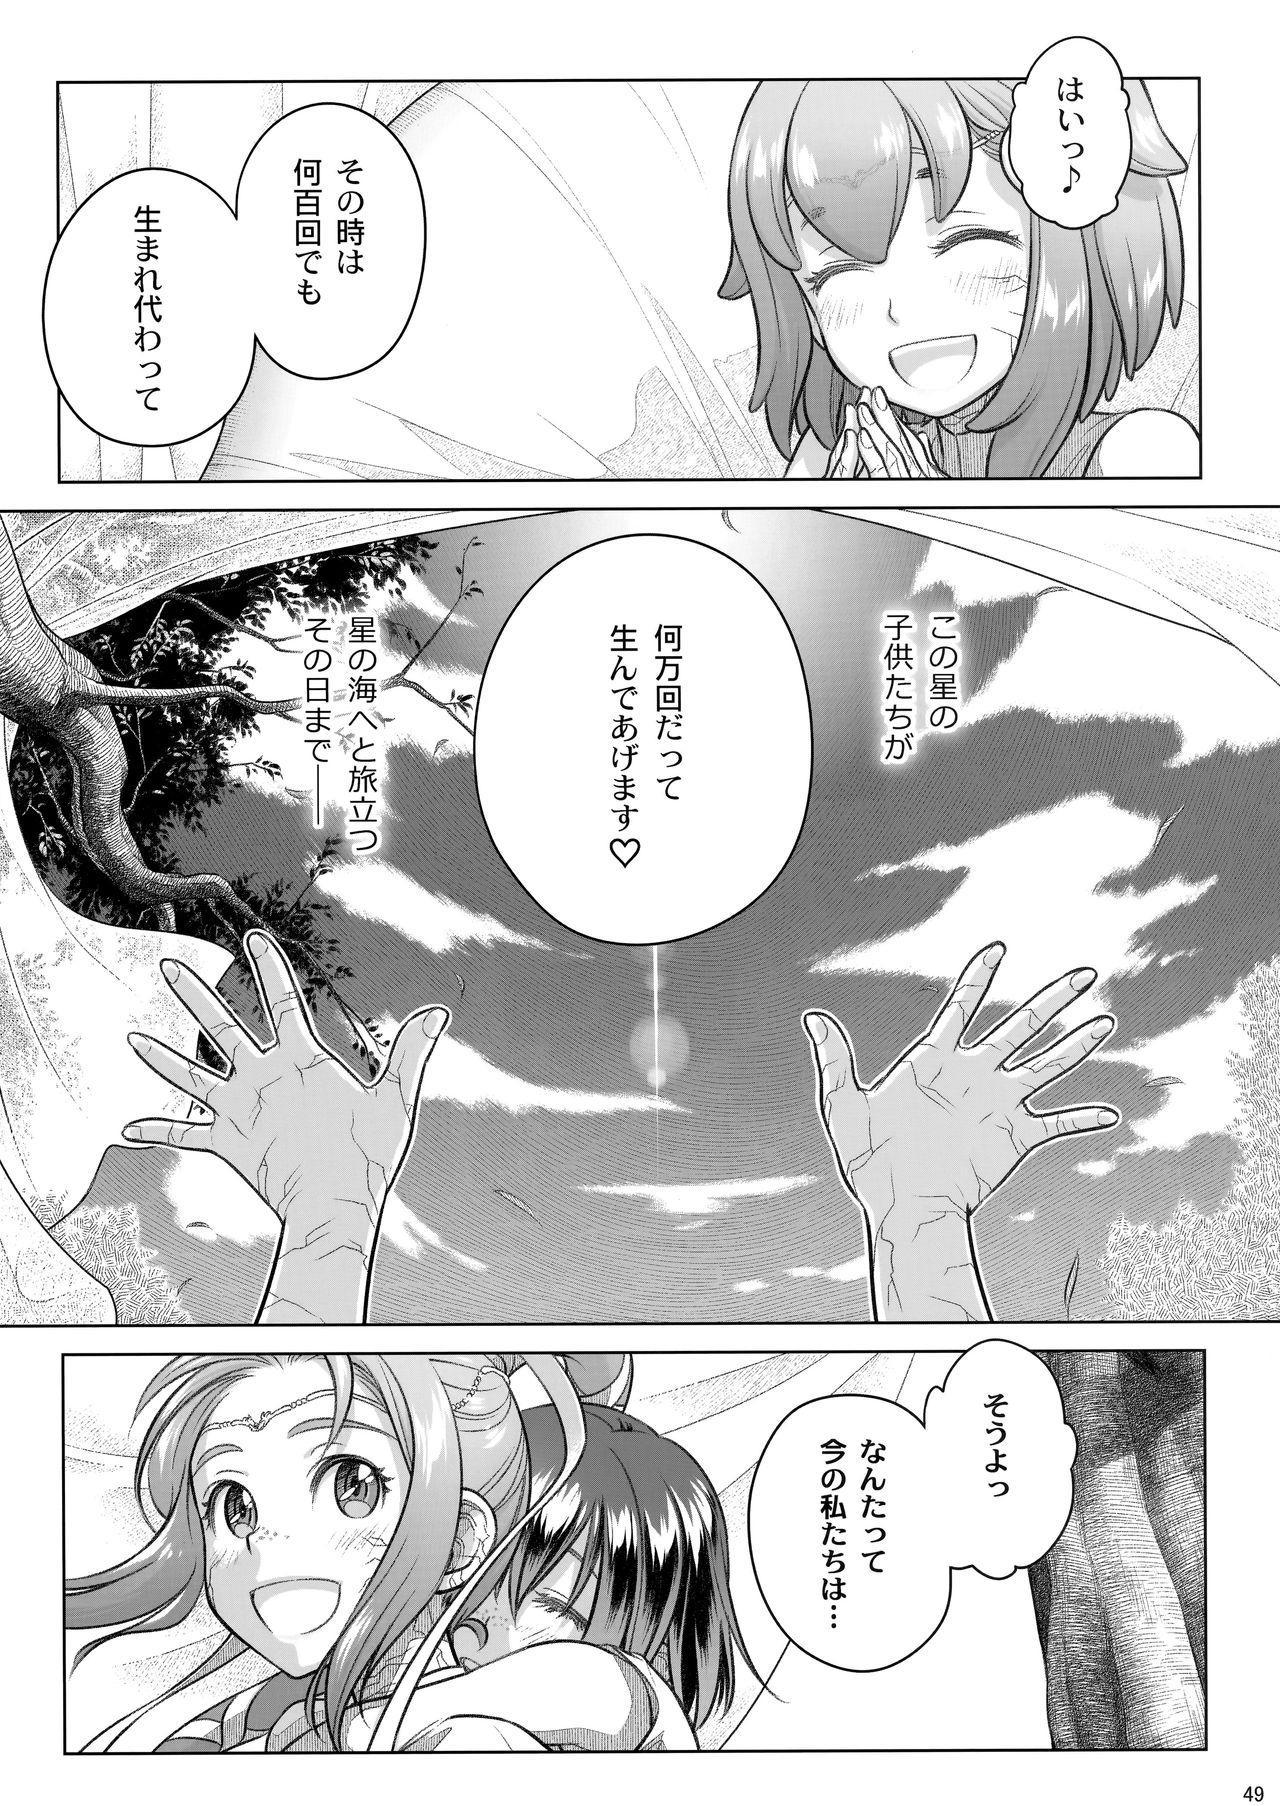 Sorako no Tabi 8 49